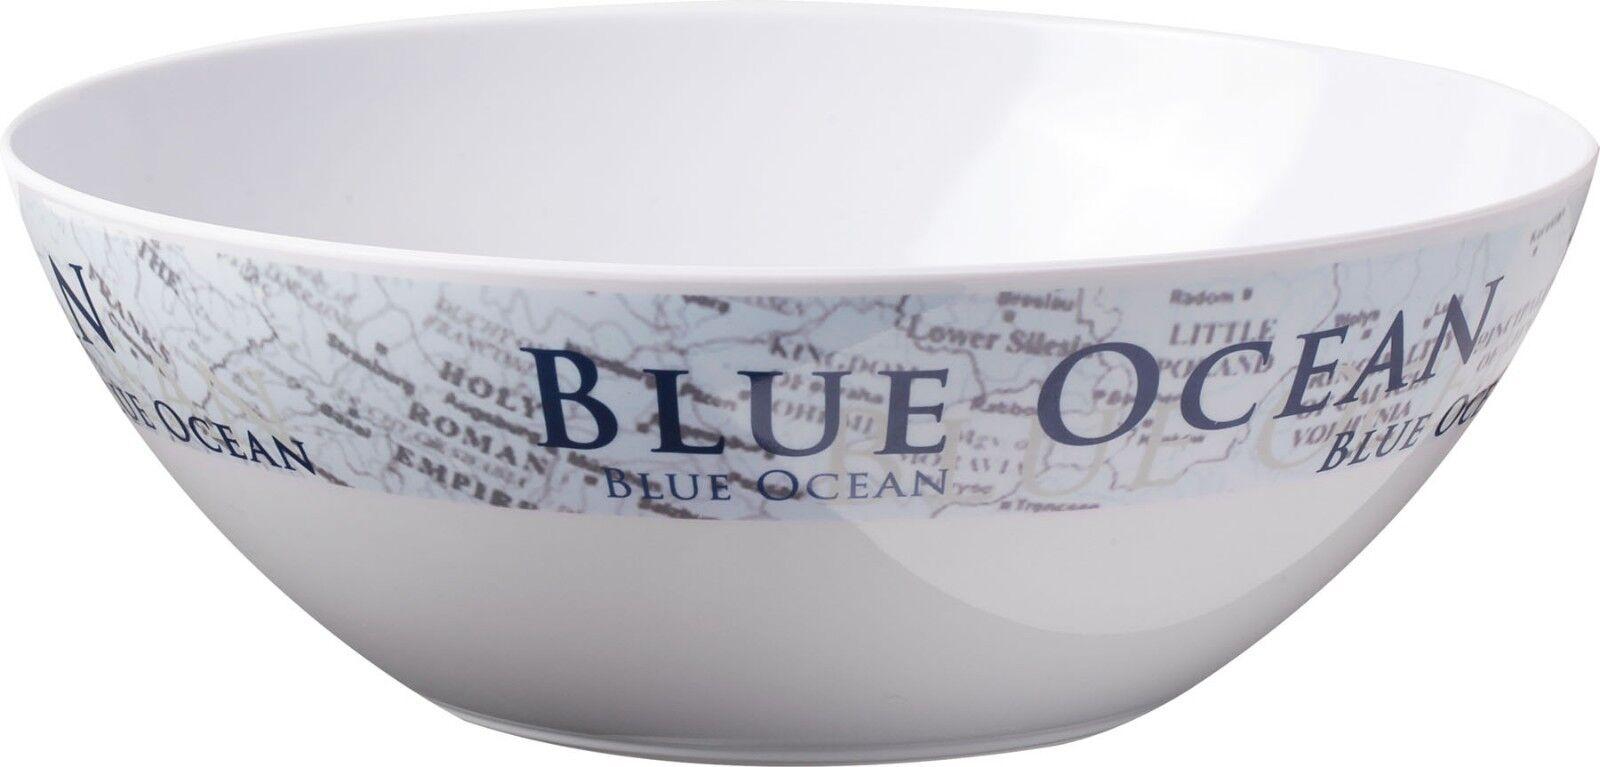 Piatti melamina stile nautica Blue Blue Blue Ocean Brunner antiscivolo resistenti camping a85667